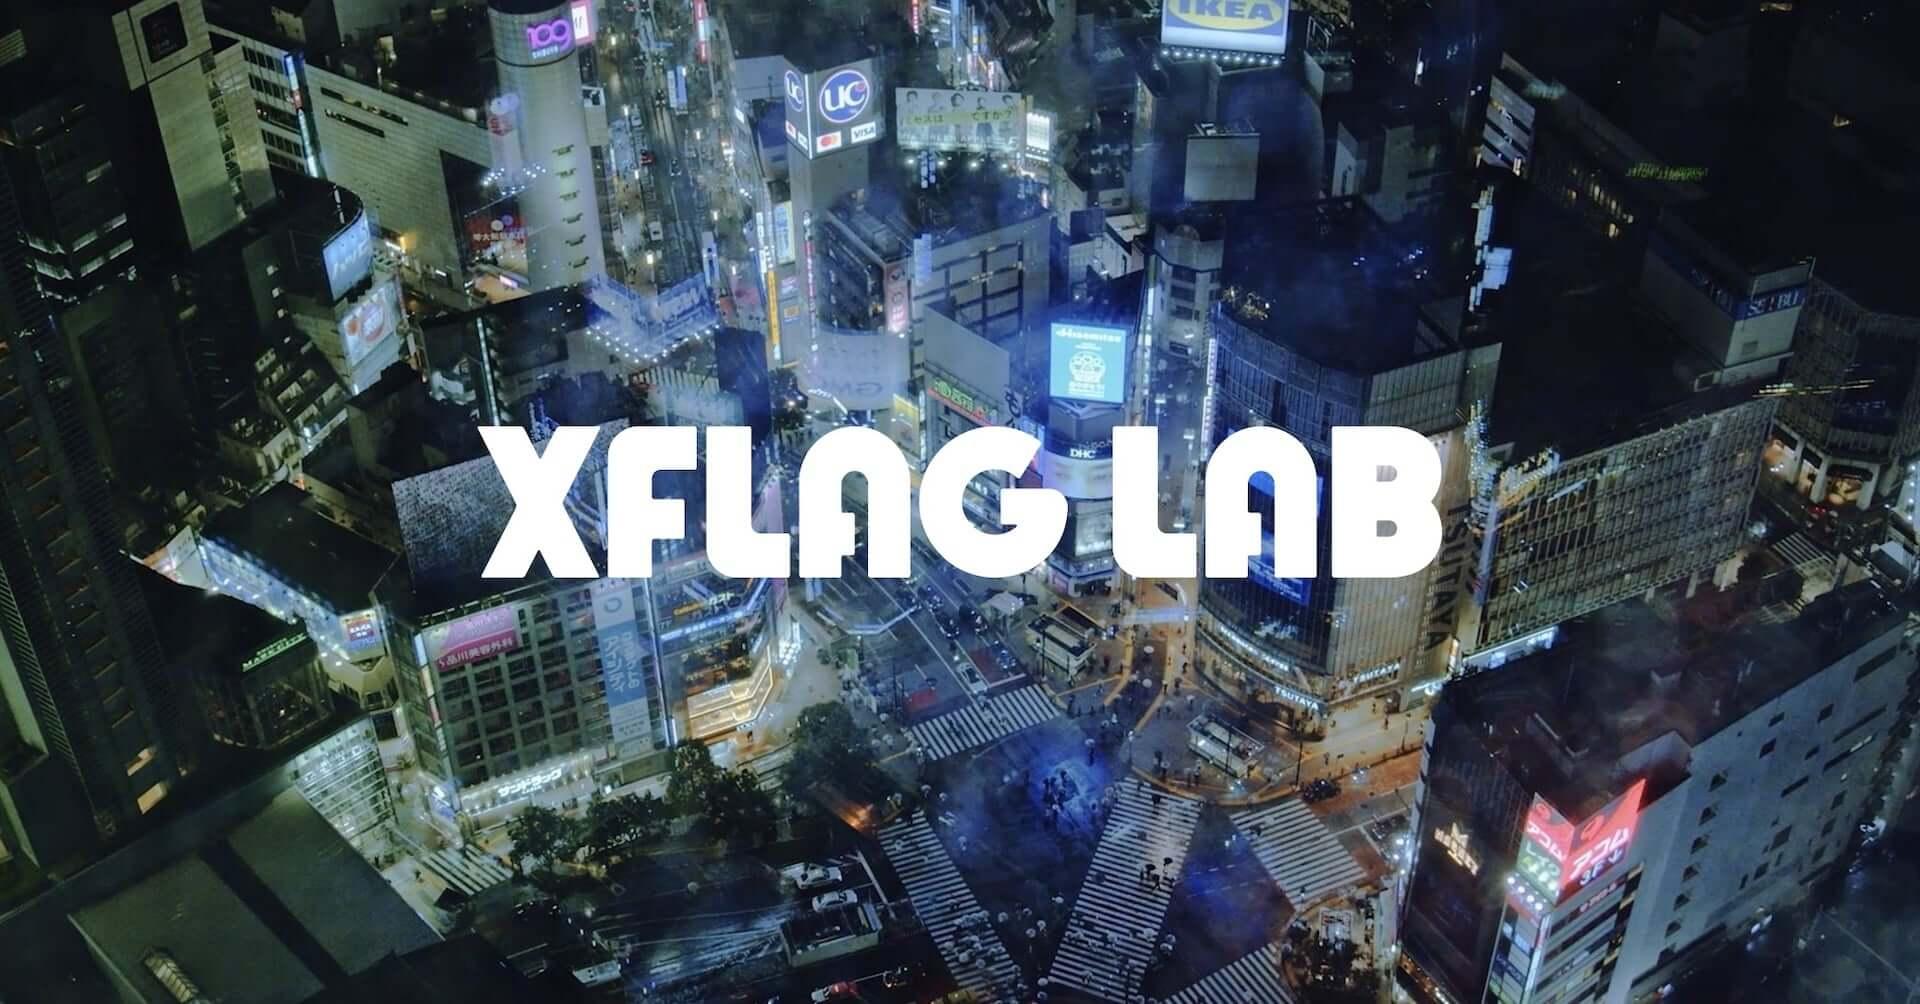 XFLAGが新プロジェクト「XFLAG LAB」を始動!FC東京×atmos×umbroのコラボスニーカー&Tシャツが発売決定 lf200804_xflag_1-1920x1004